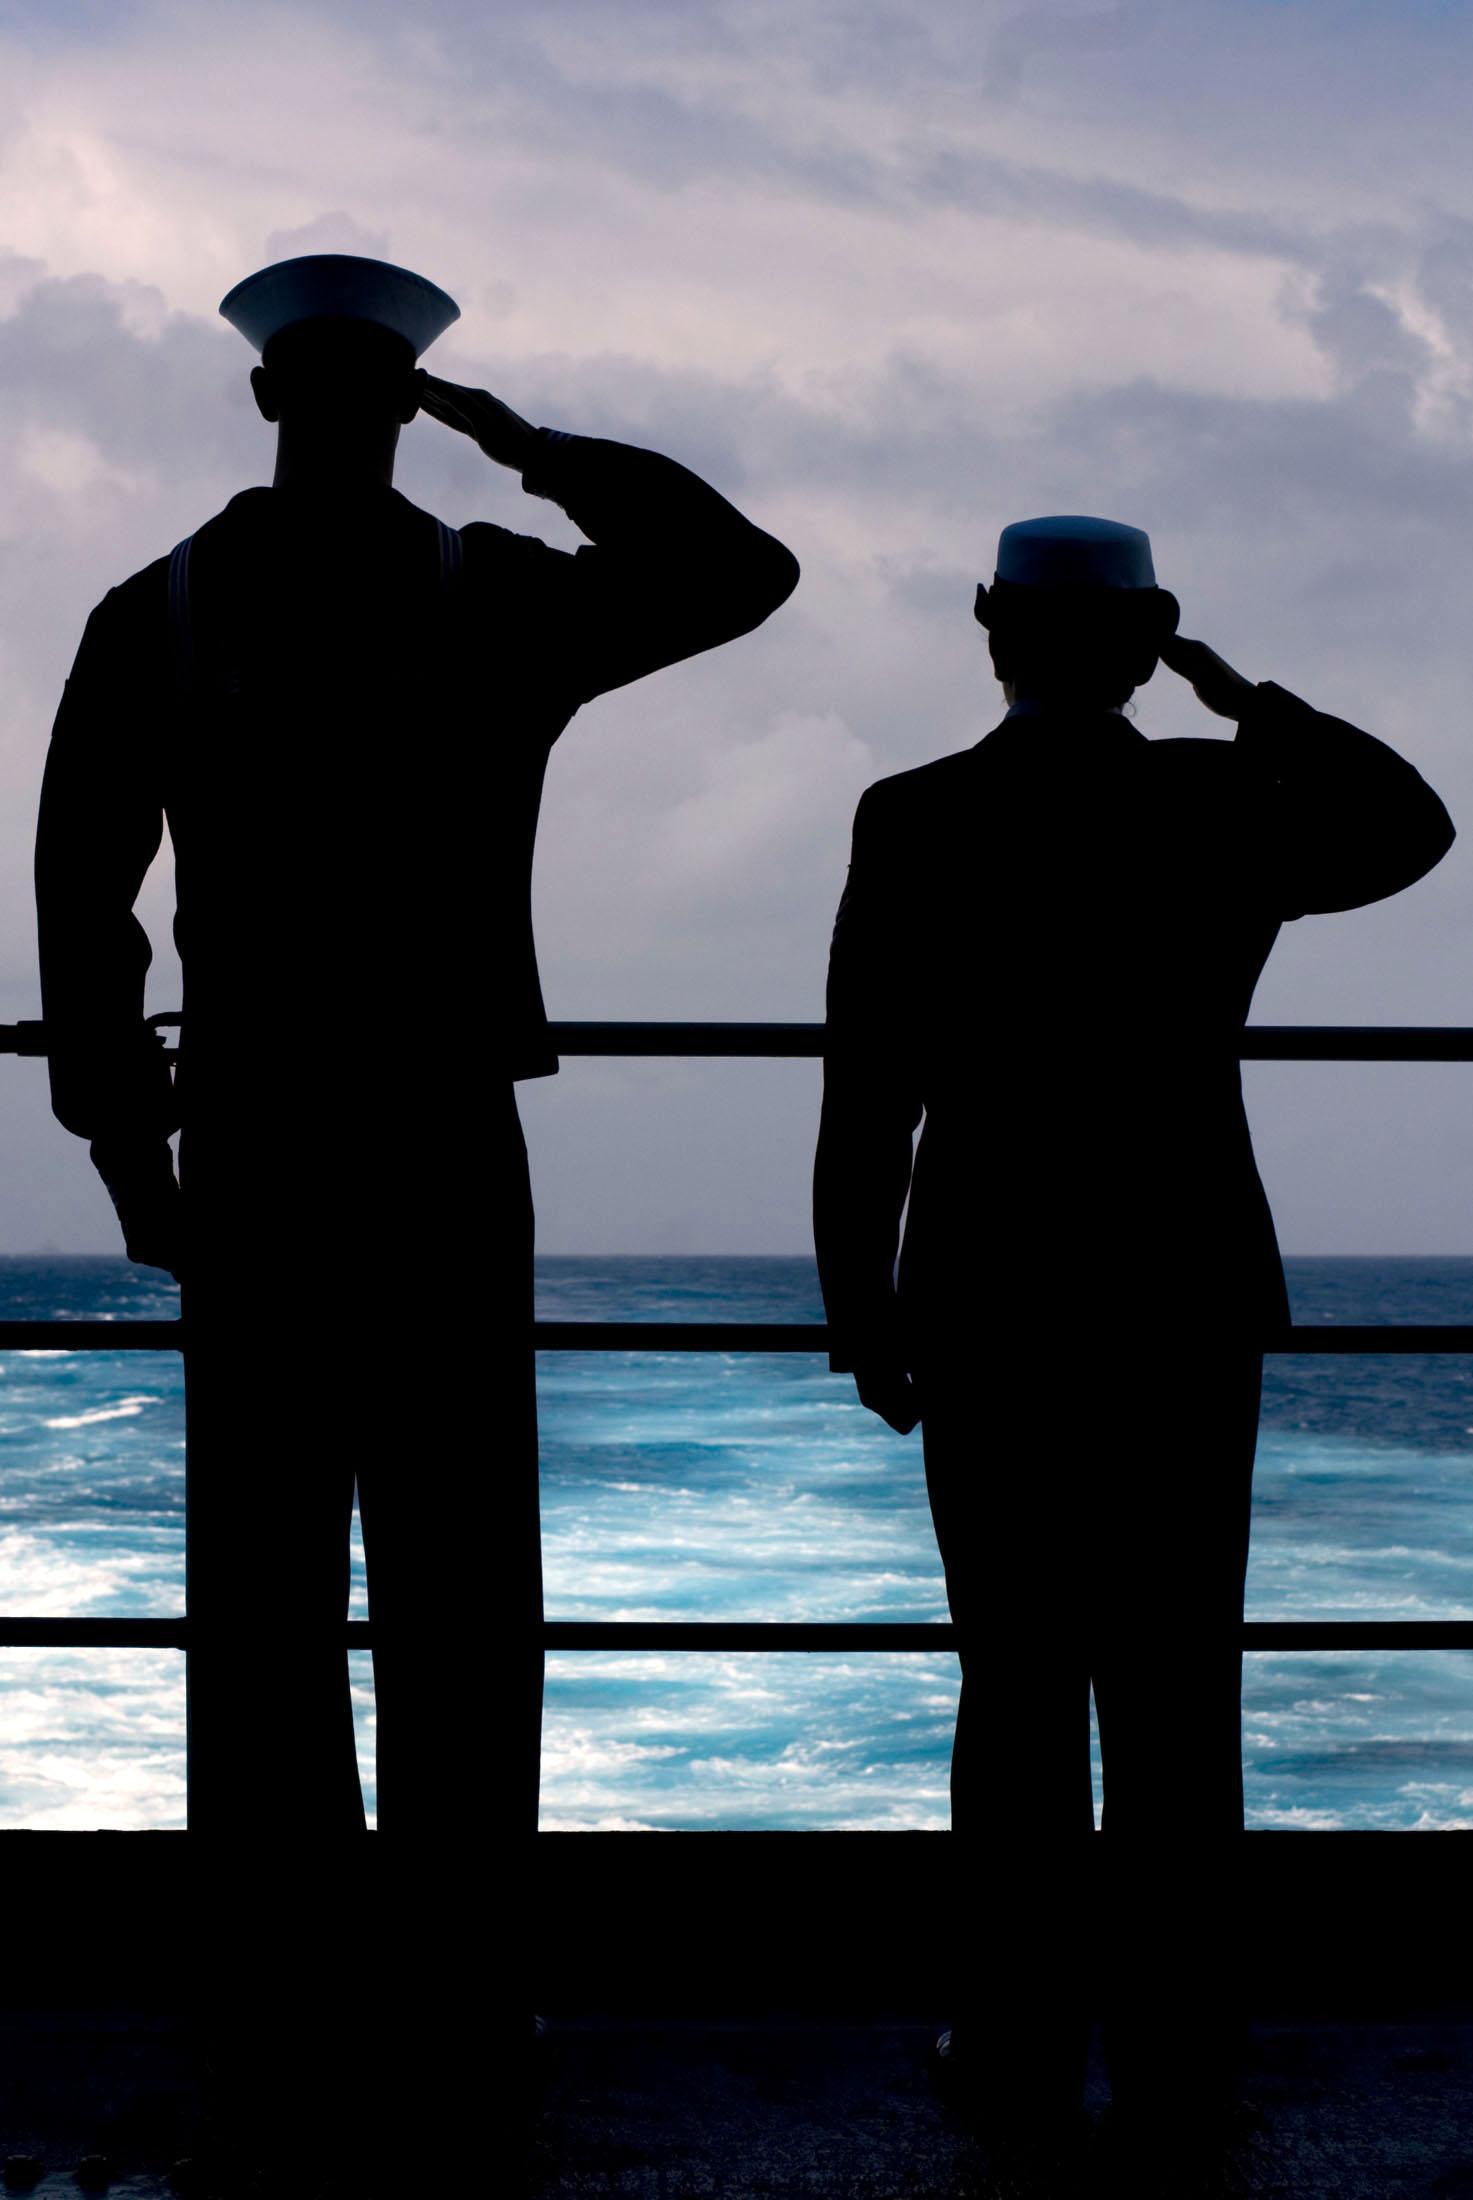 File:US Navy 070726-N-9864S-002 Yeoman Seaman Jessica ...